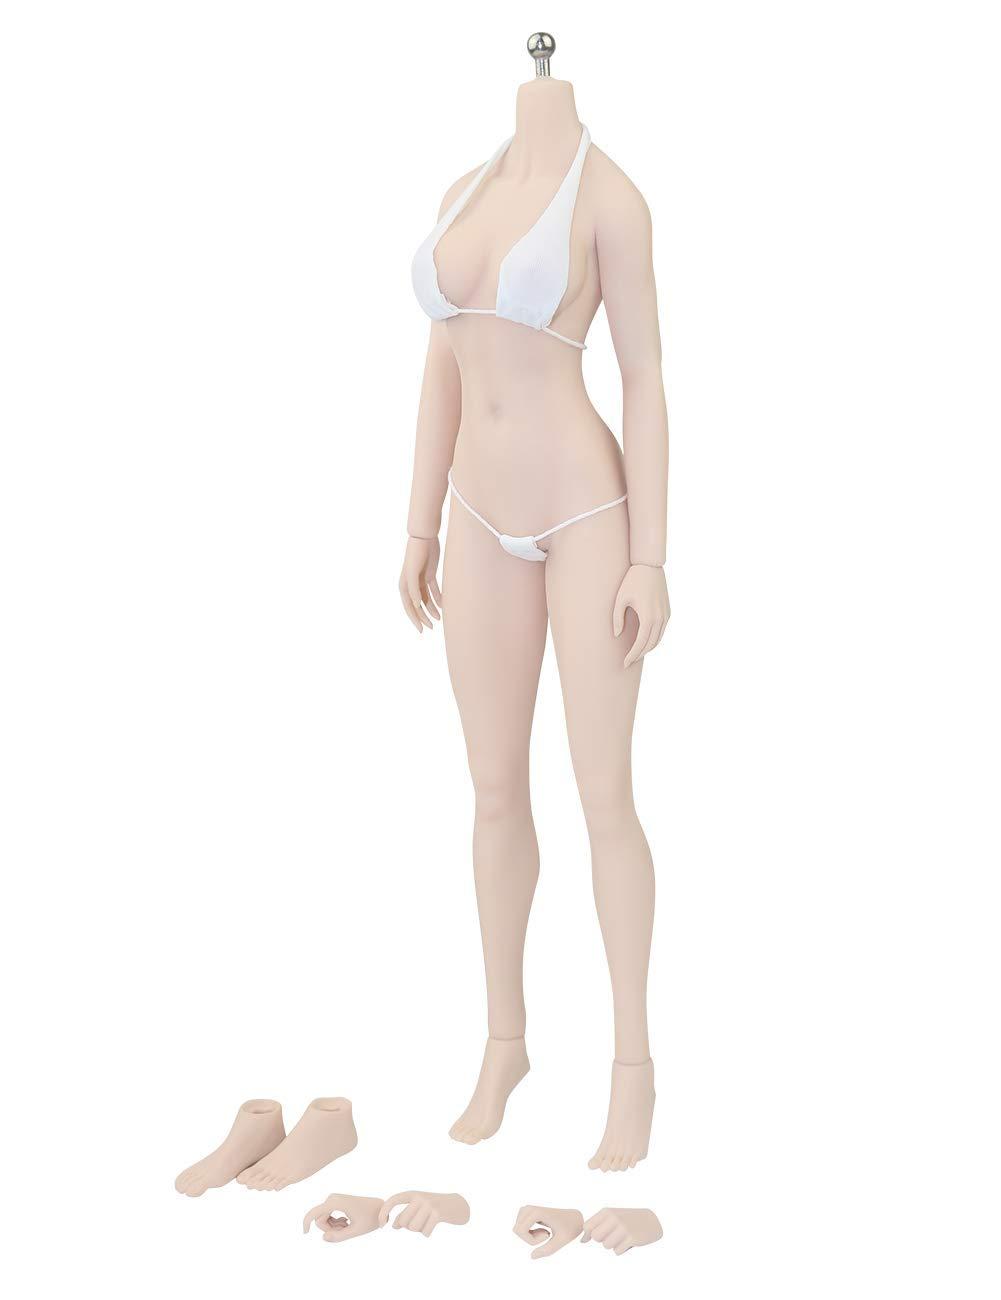 Phicen 1/6 Asia Female Seamless Body with Metal Skeleton Pale Skin Tones PLMB2018-S24A